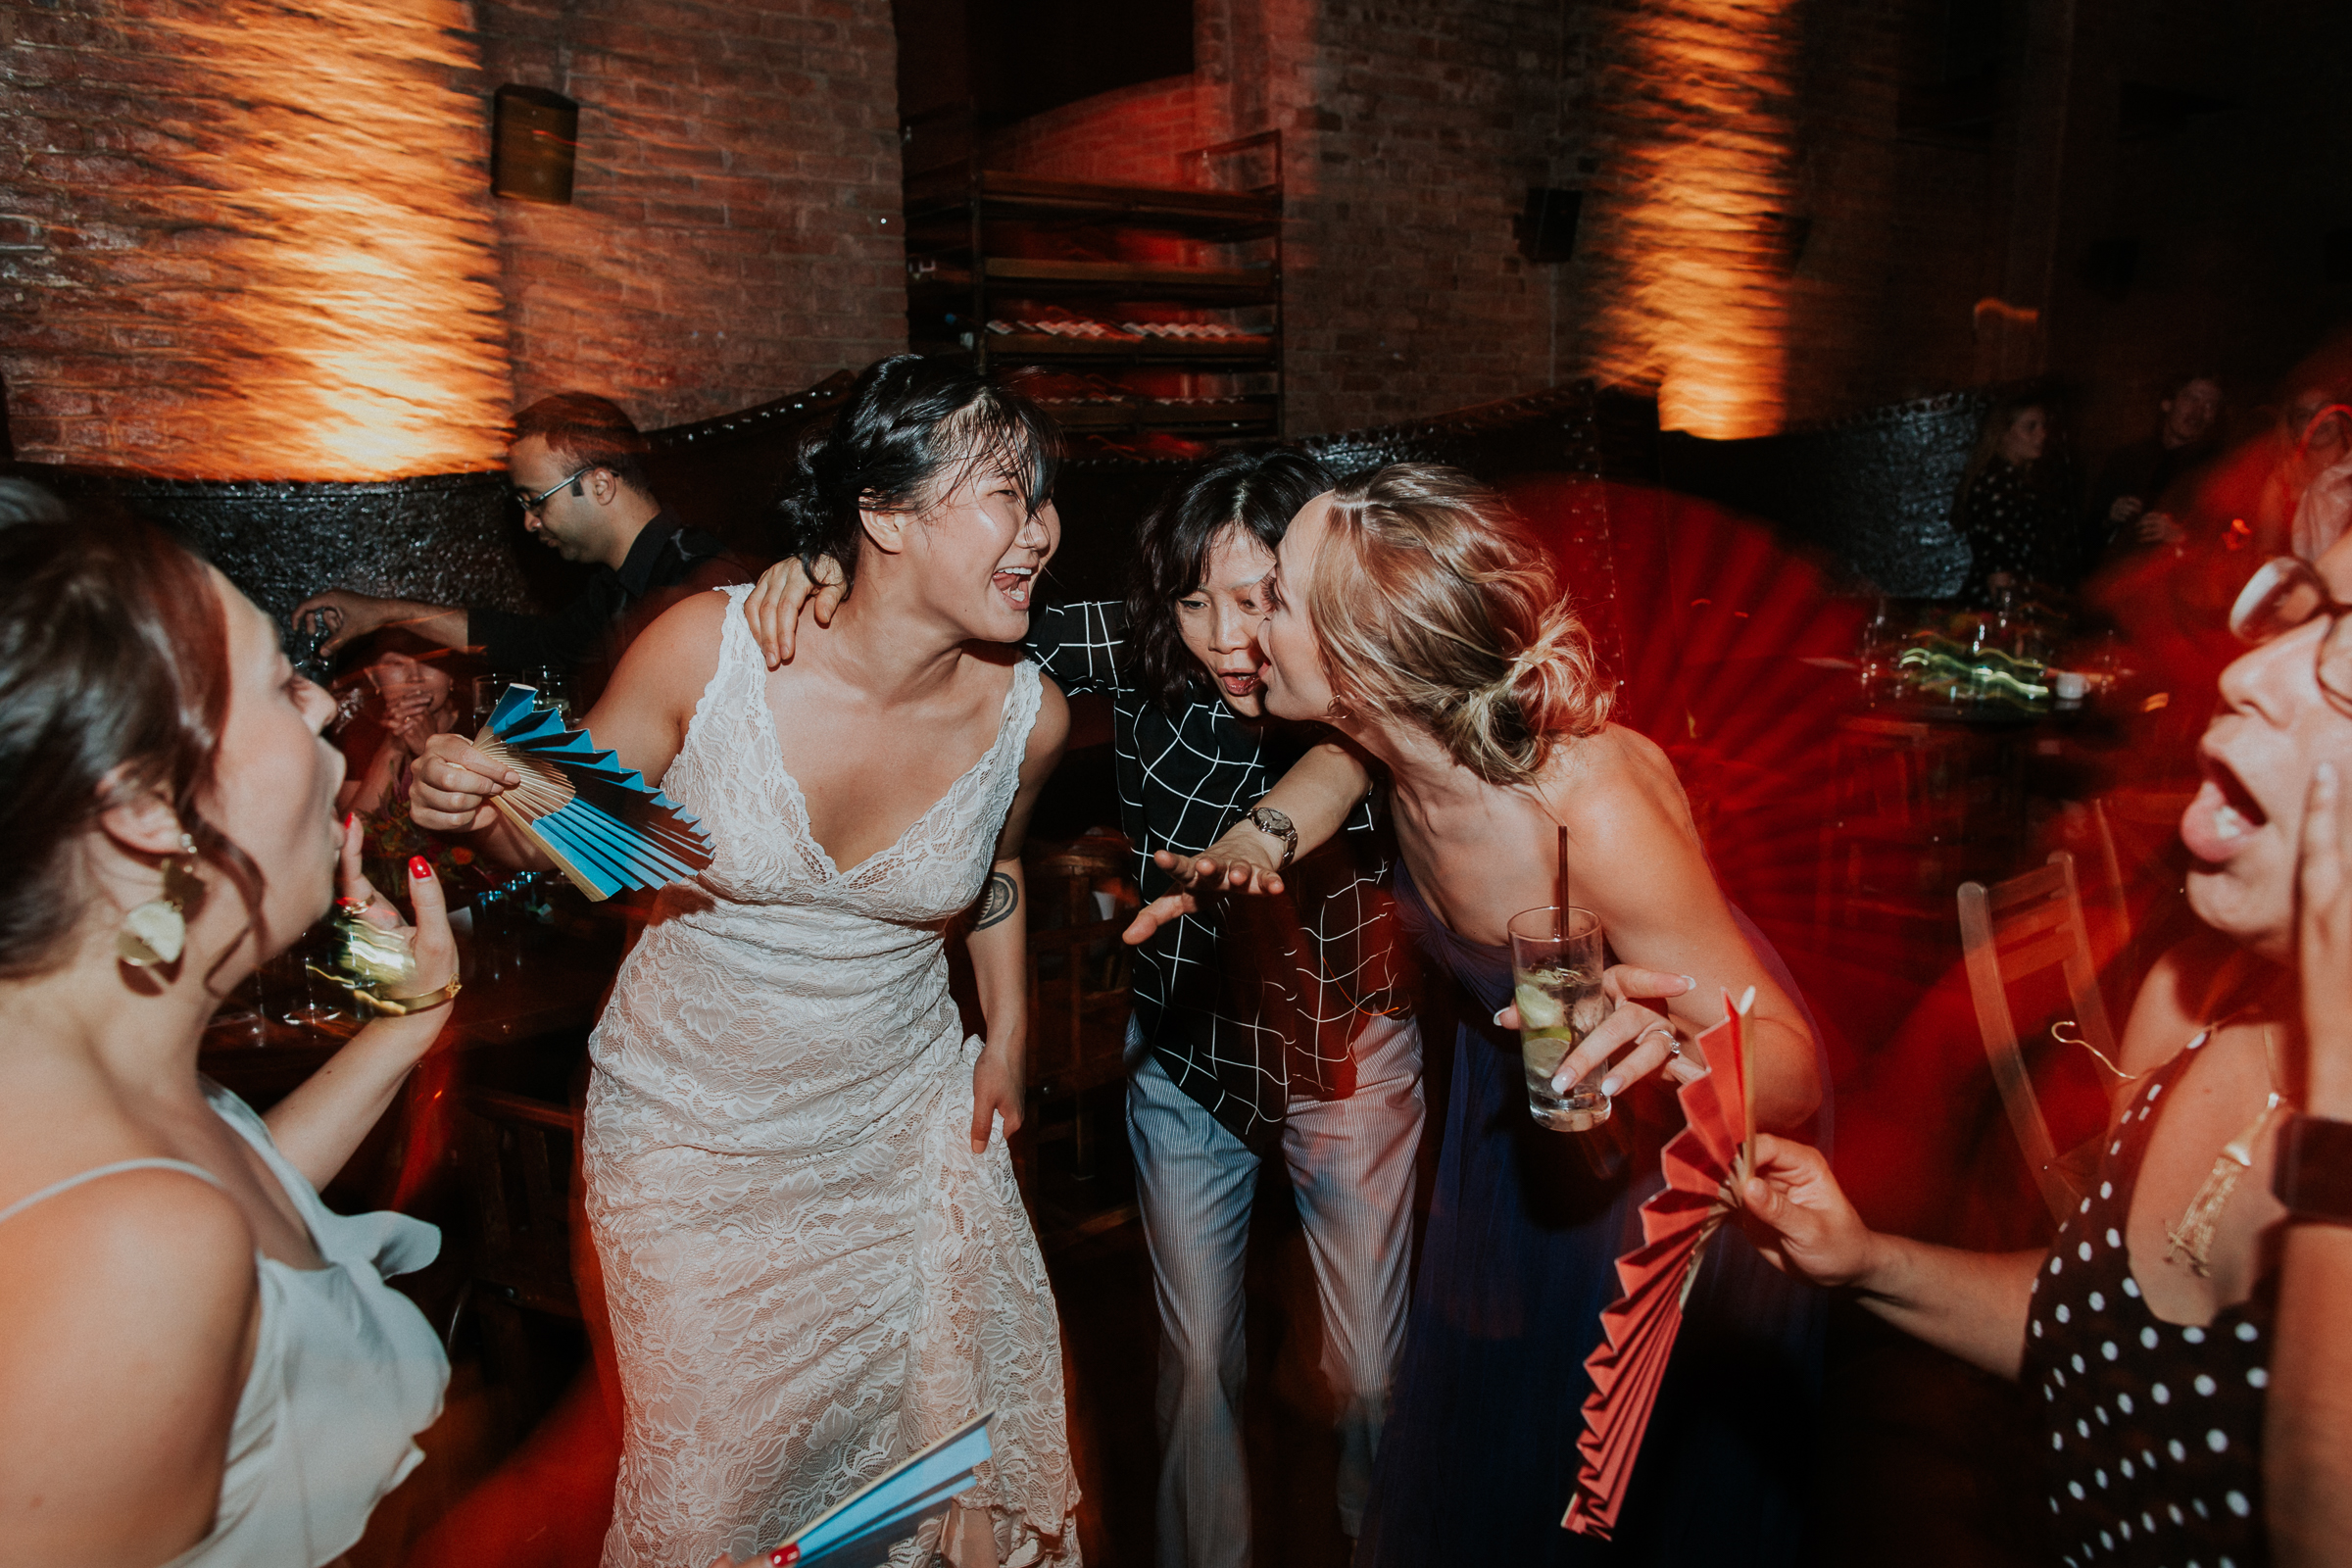 My-Moon-Brooklyn-LGBT-Gay-Documentary-Wedding-Photographer-117.jpg